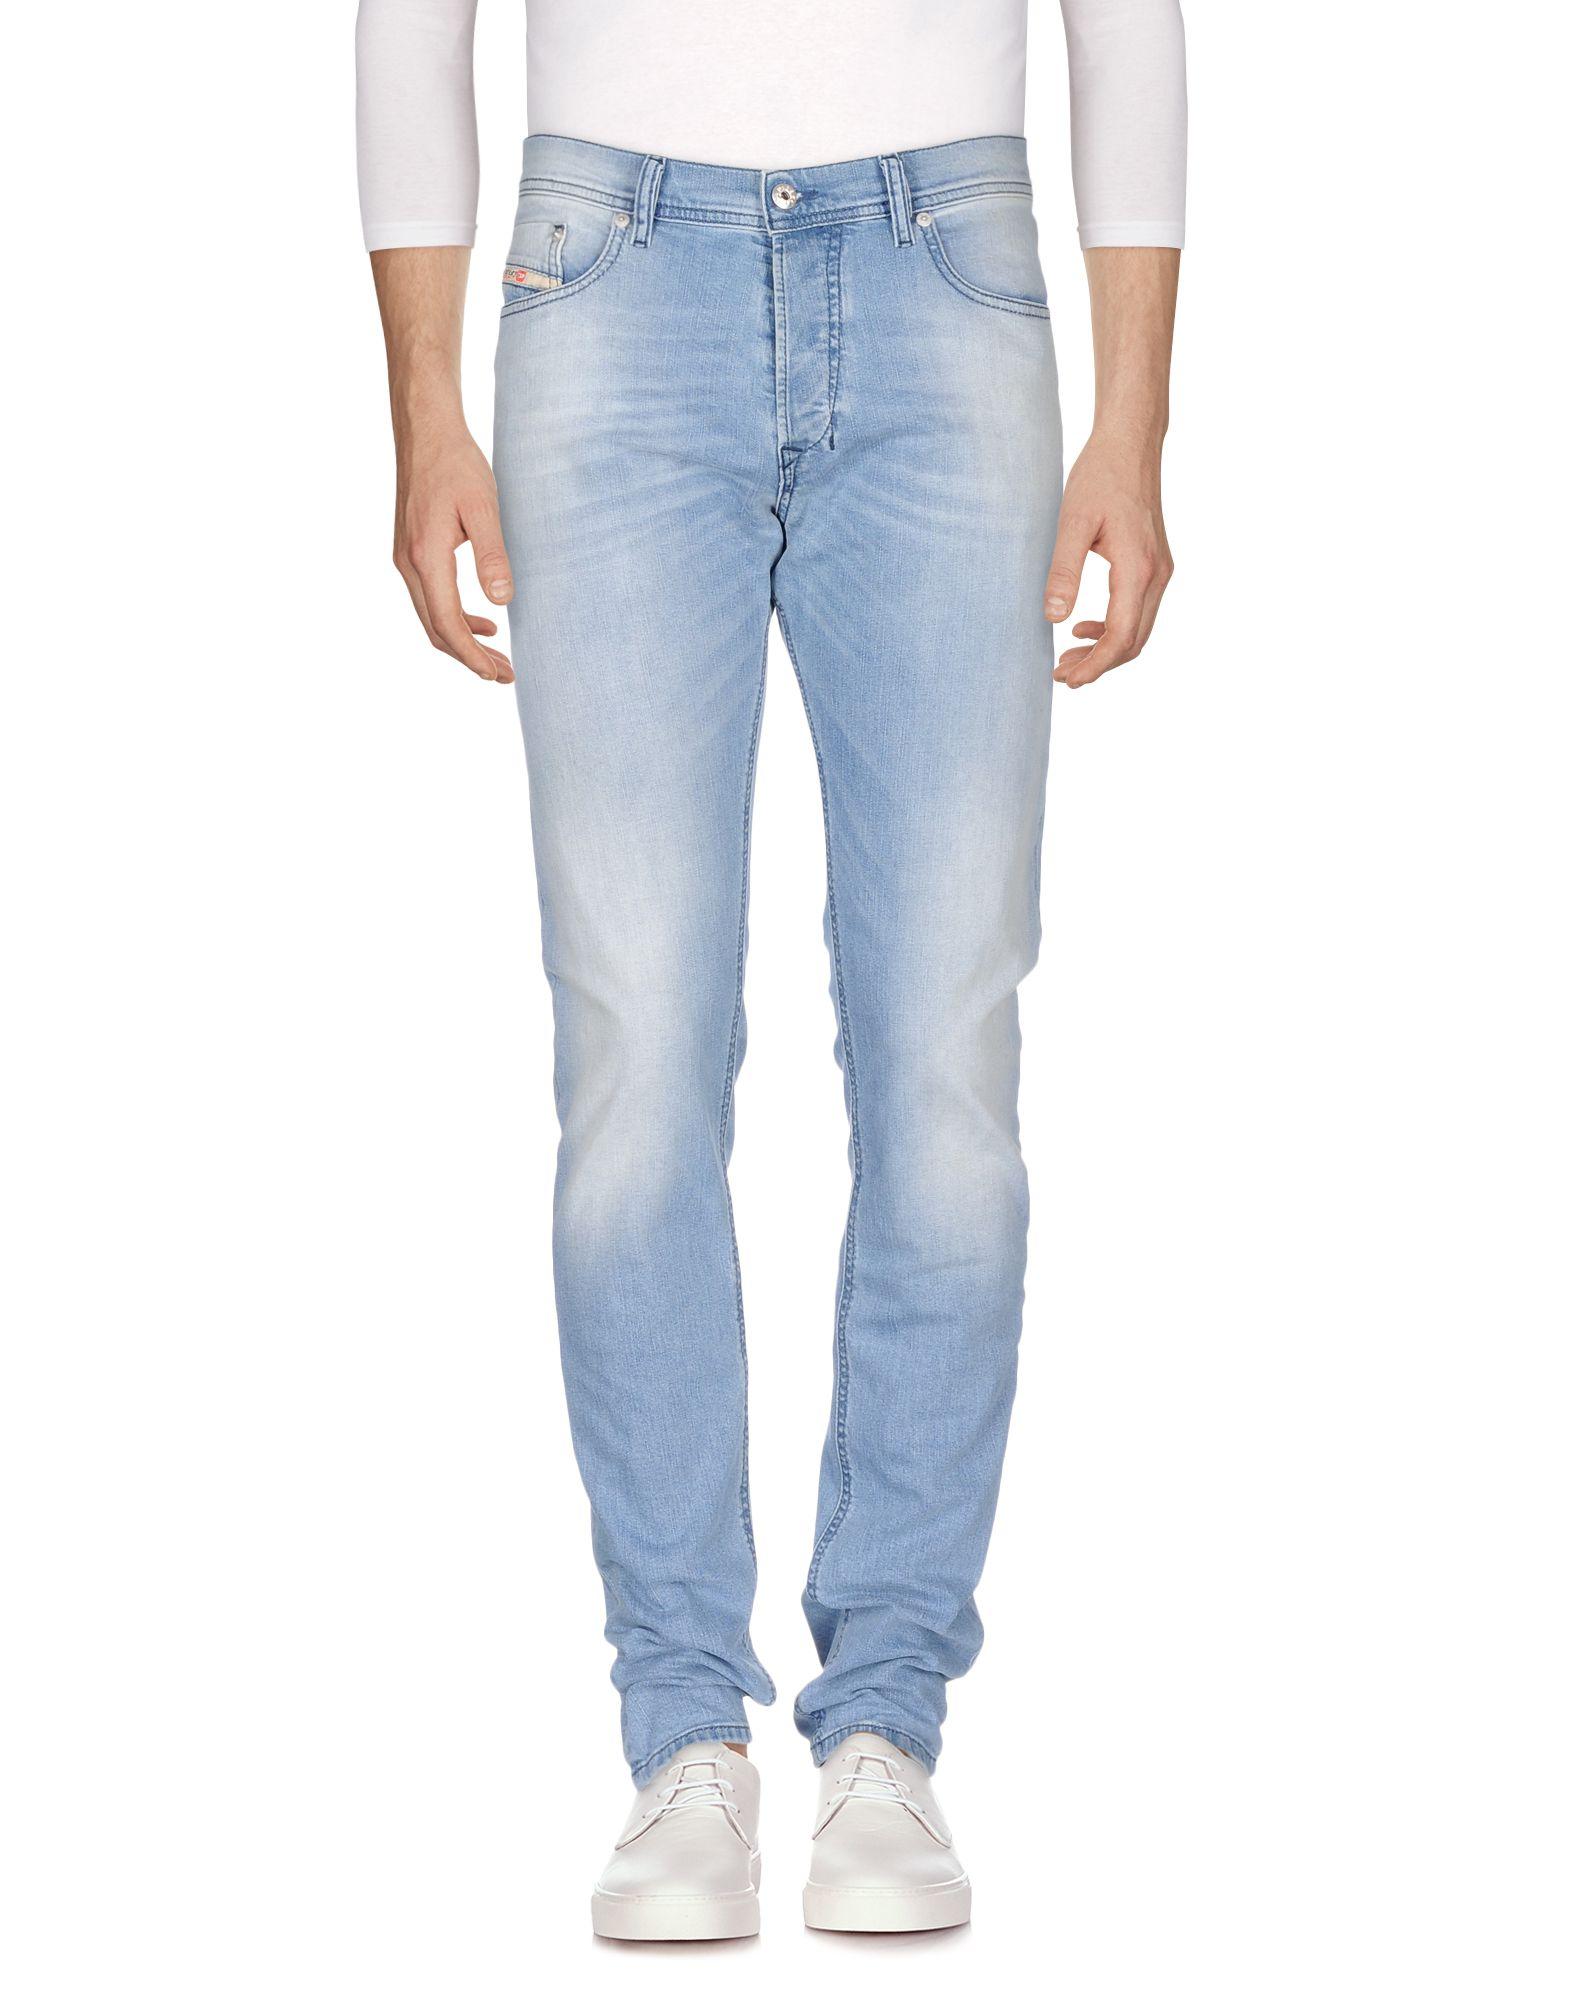 Pantaloni Jeans Uomo Diesel Uomo Jeans - 42653242TP efacc5